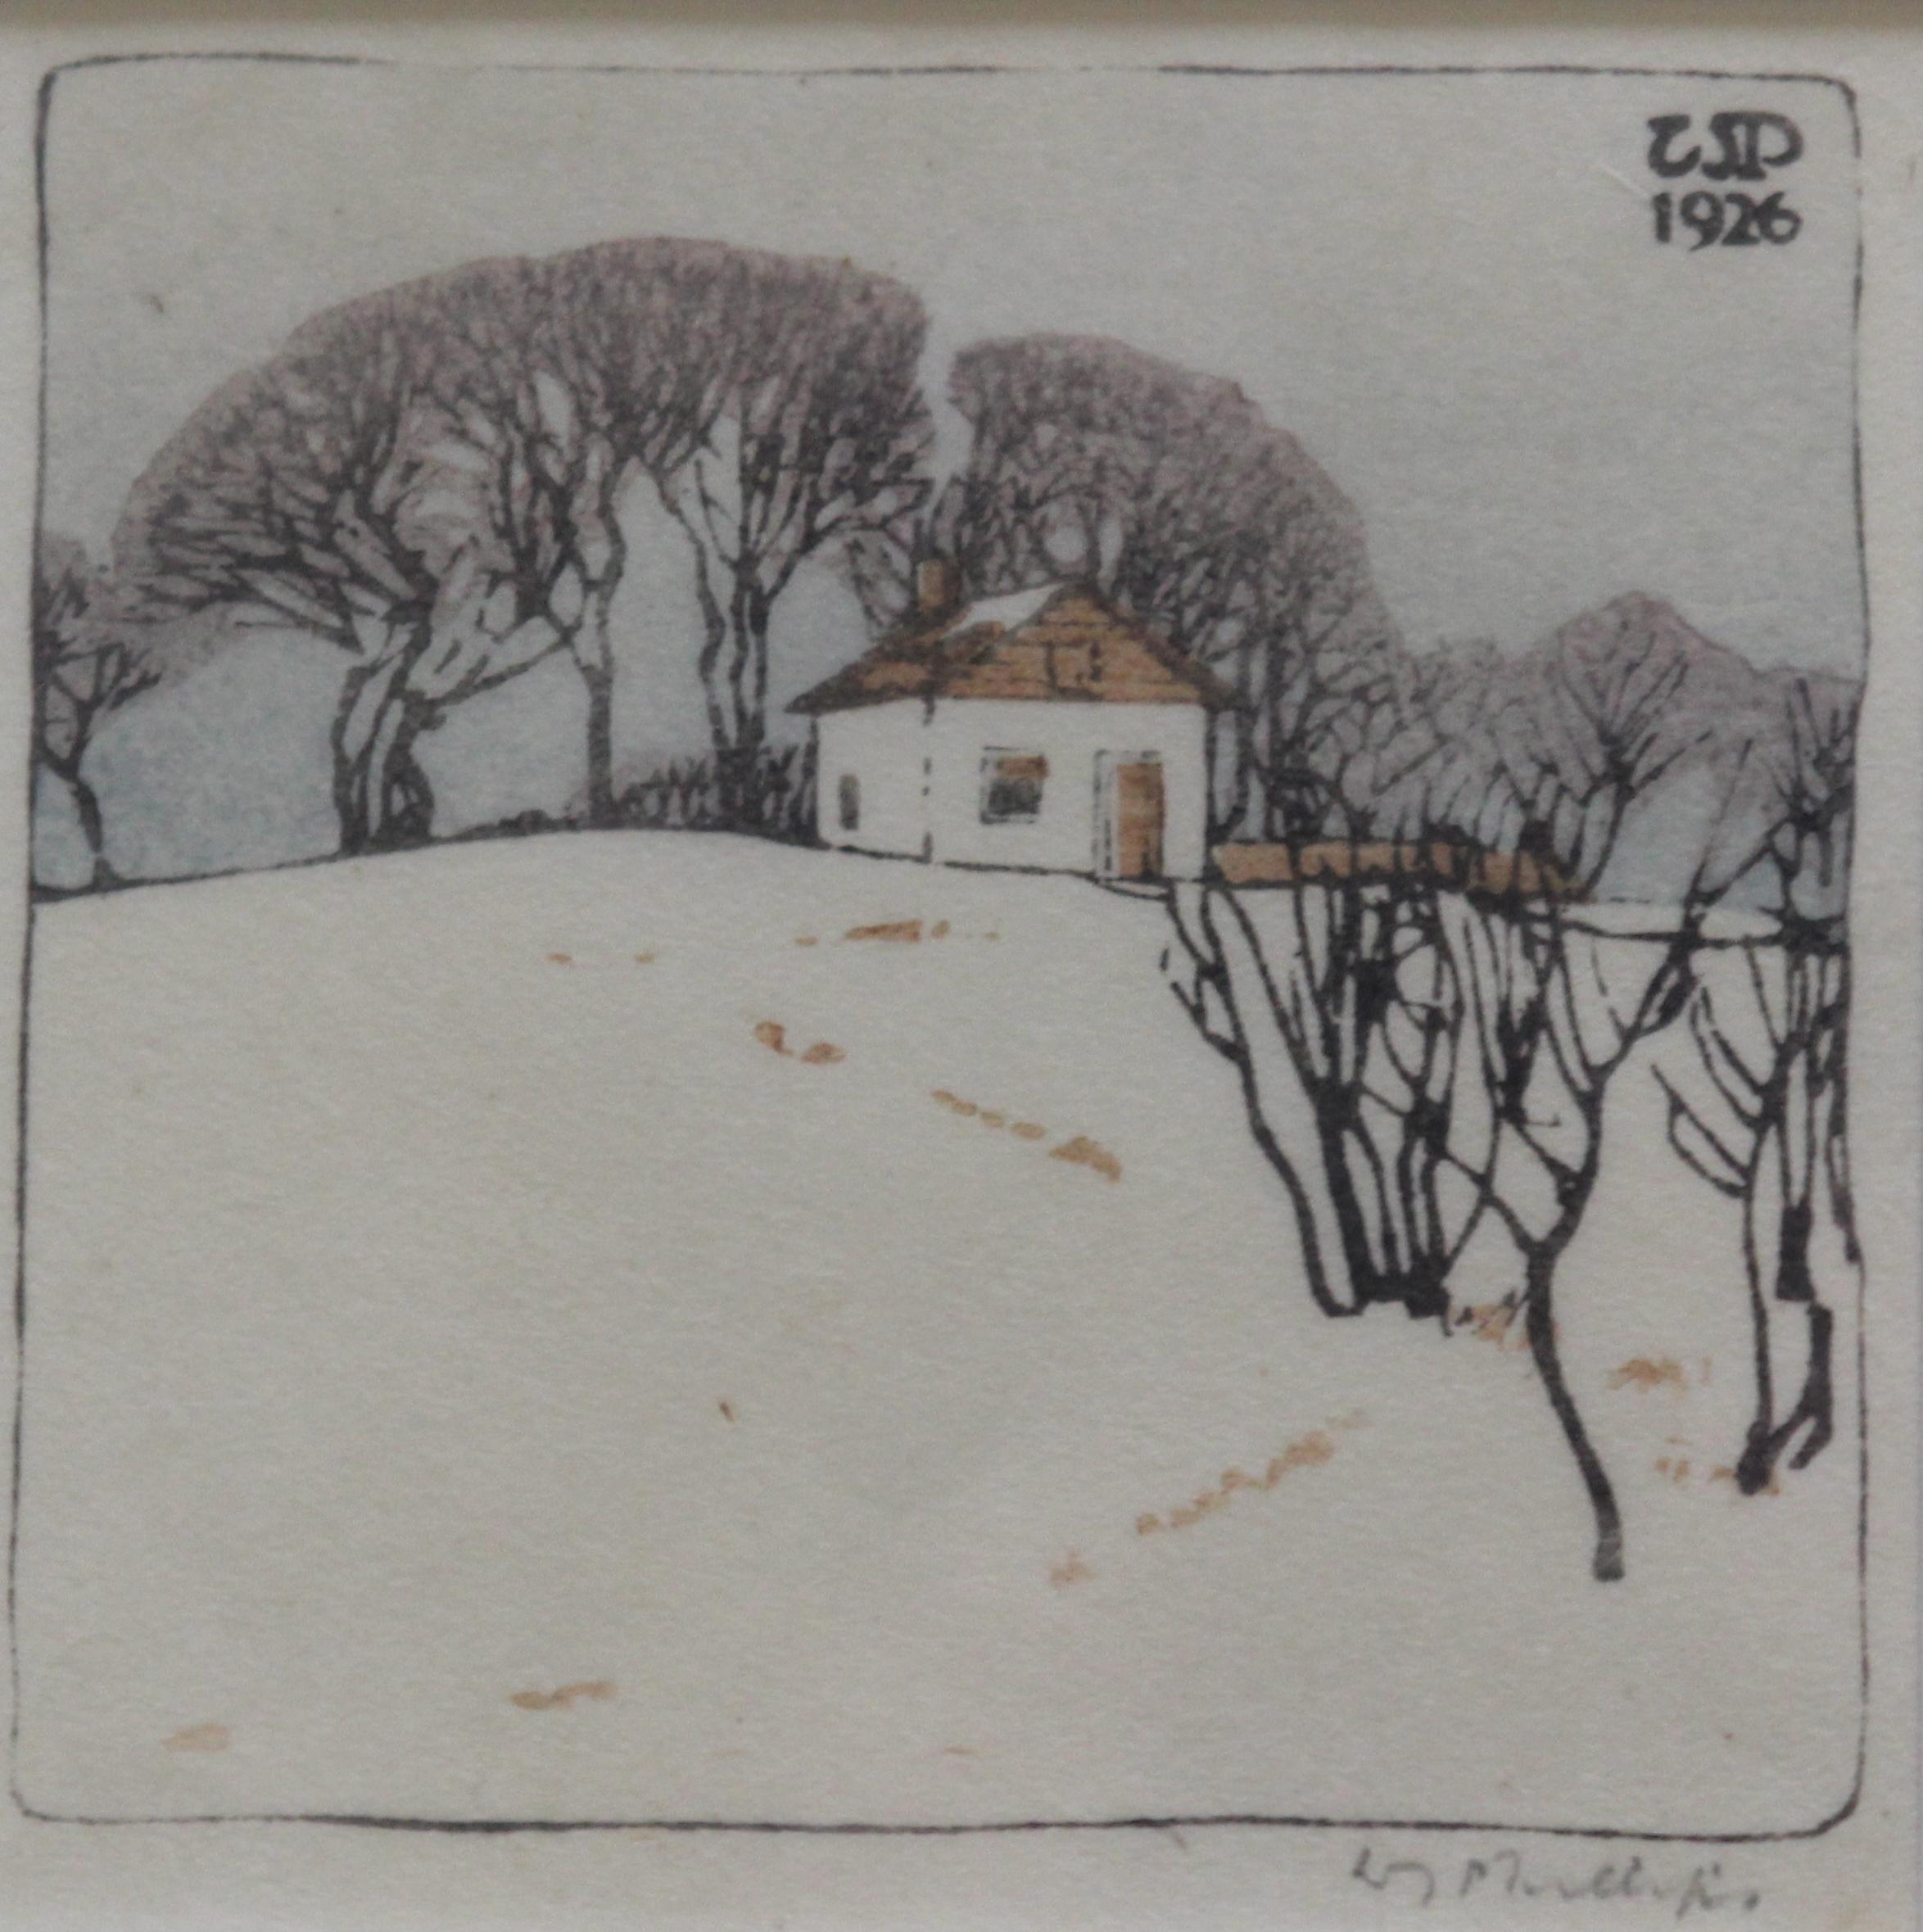 Walter J. Phillips, The Log House, 1926